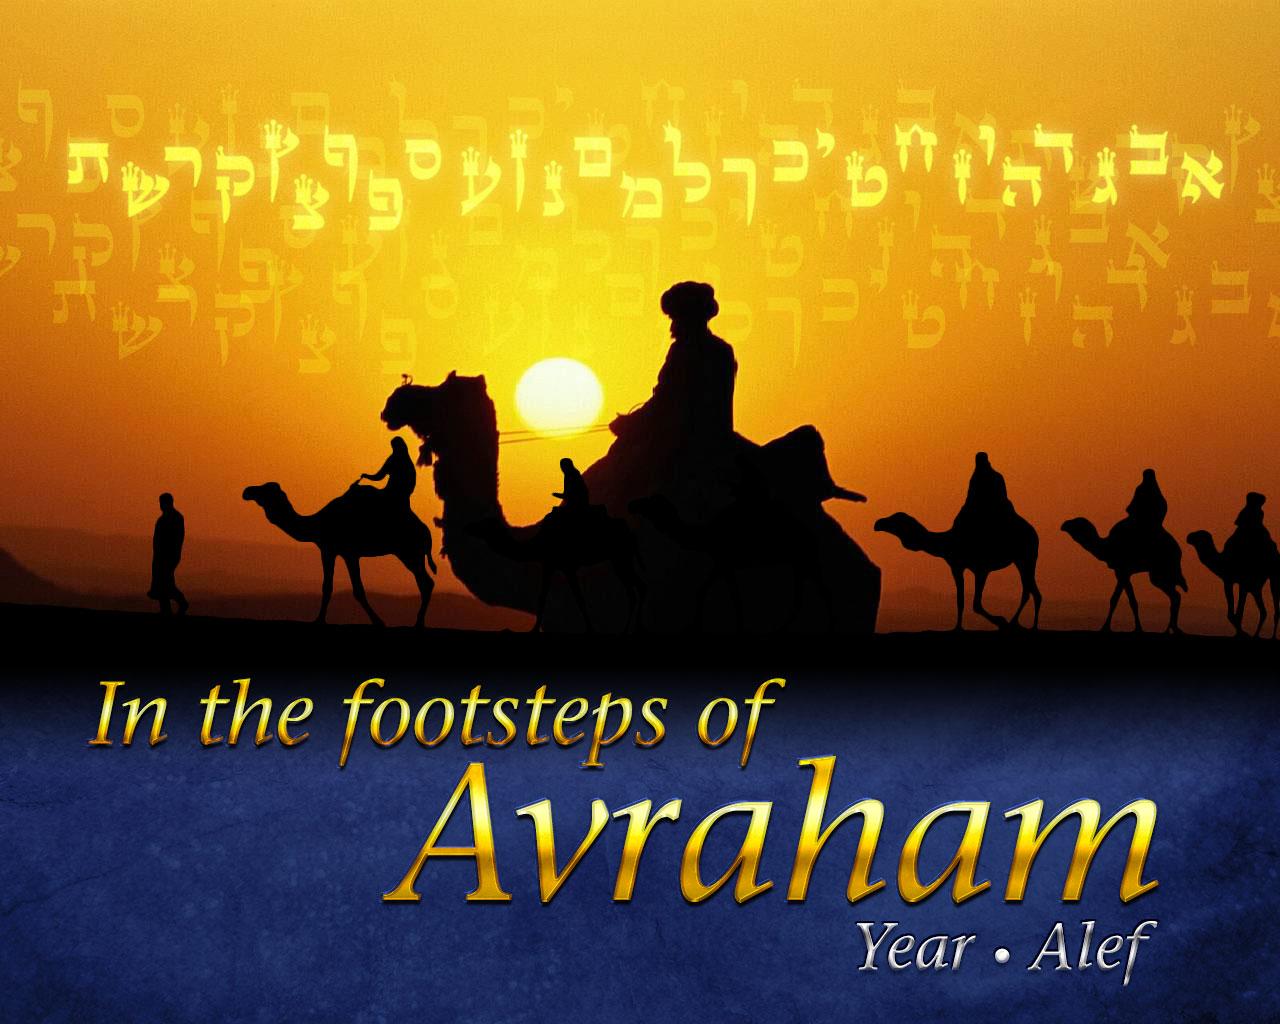 img_shuvu_footsteps_of_avraham_1280x1024_ENG